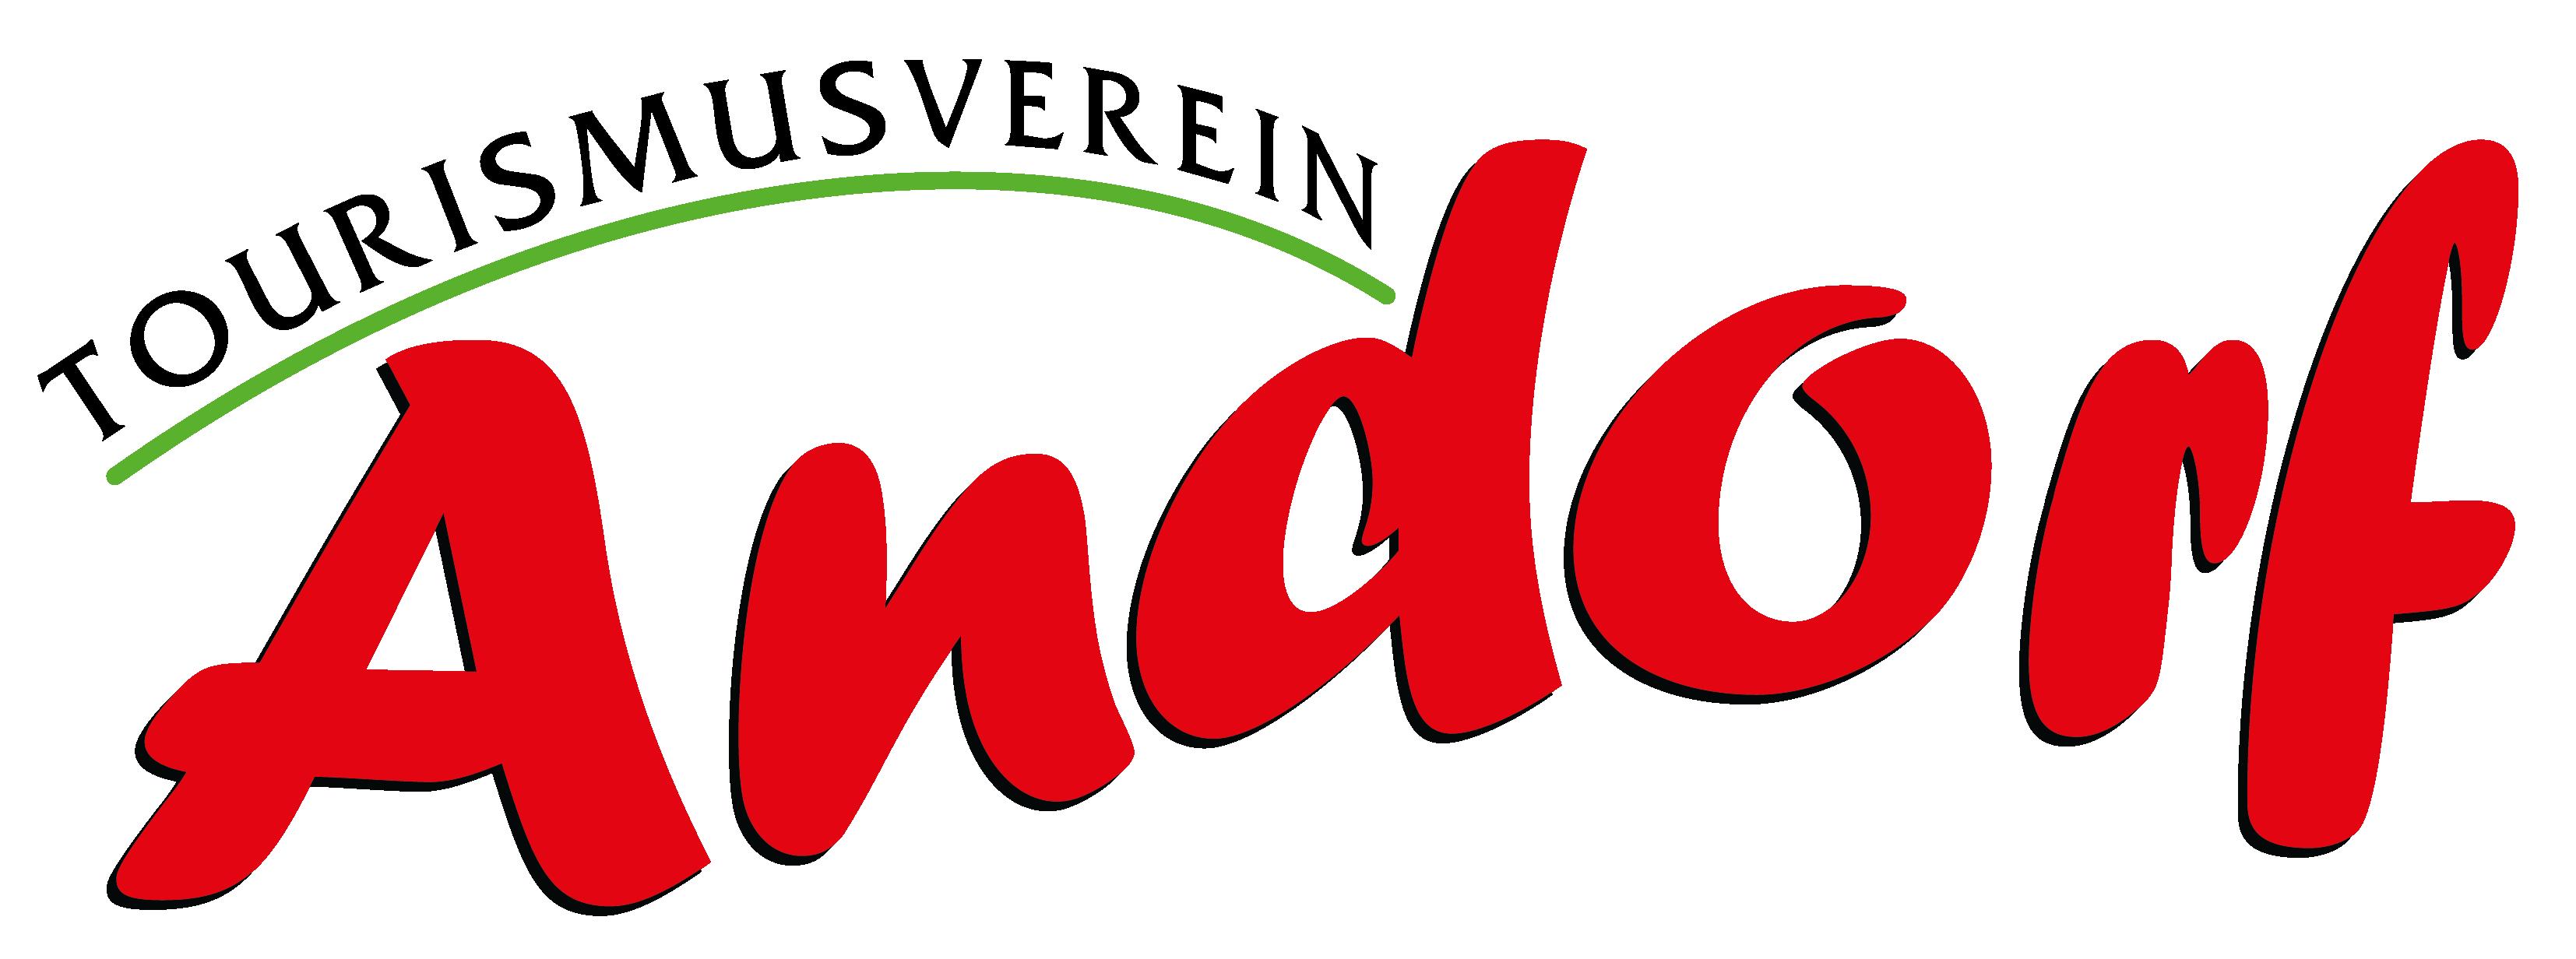 Tourismusverein Andorf